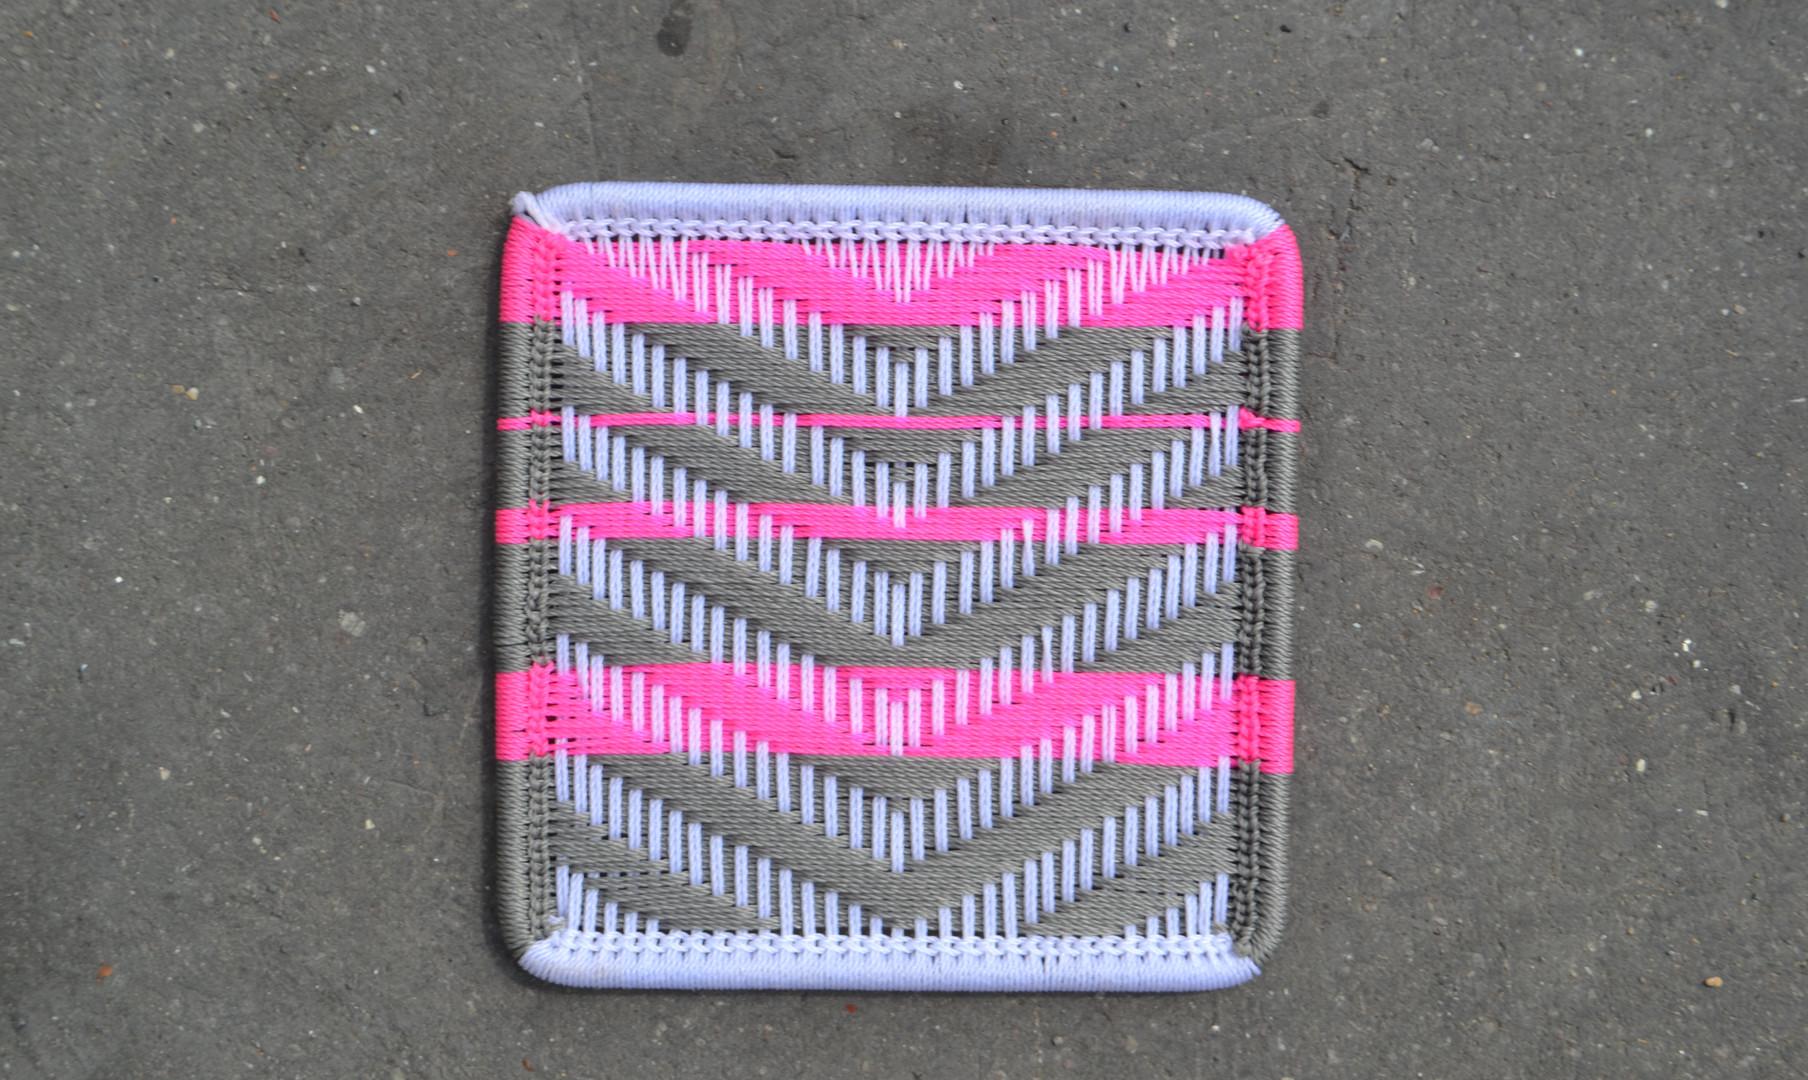 Blanc / gris clair / bandes rose